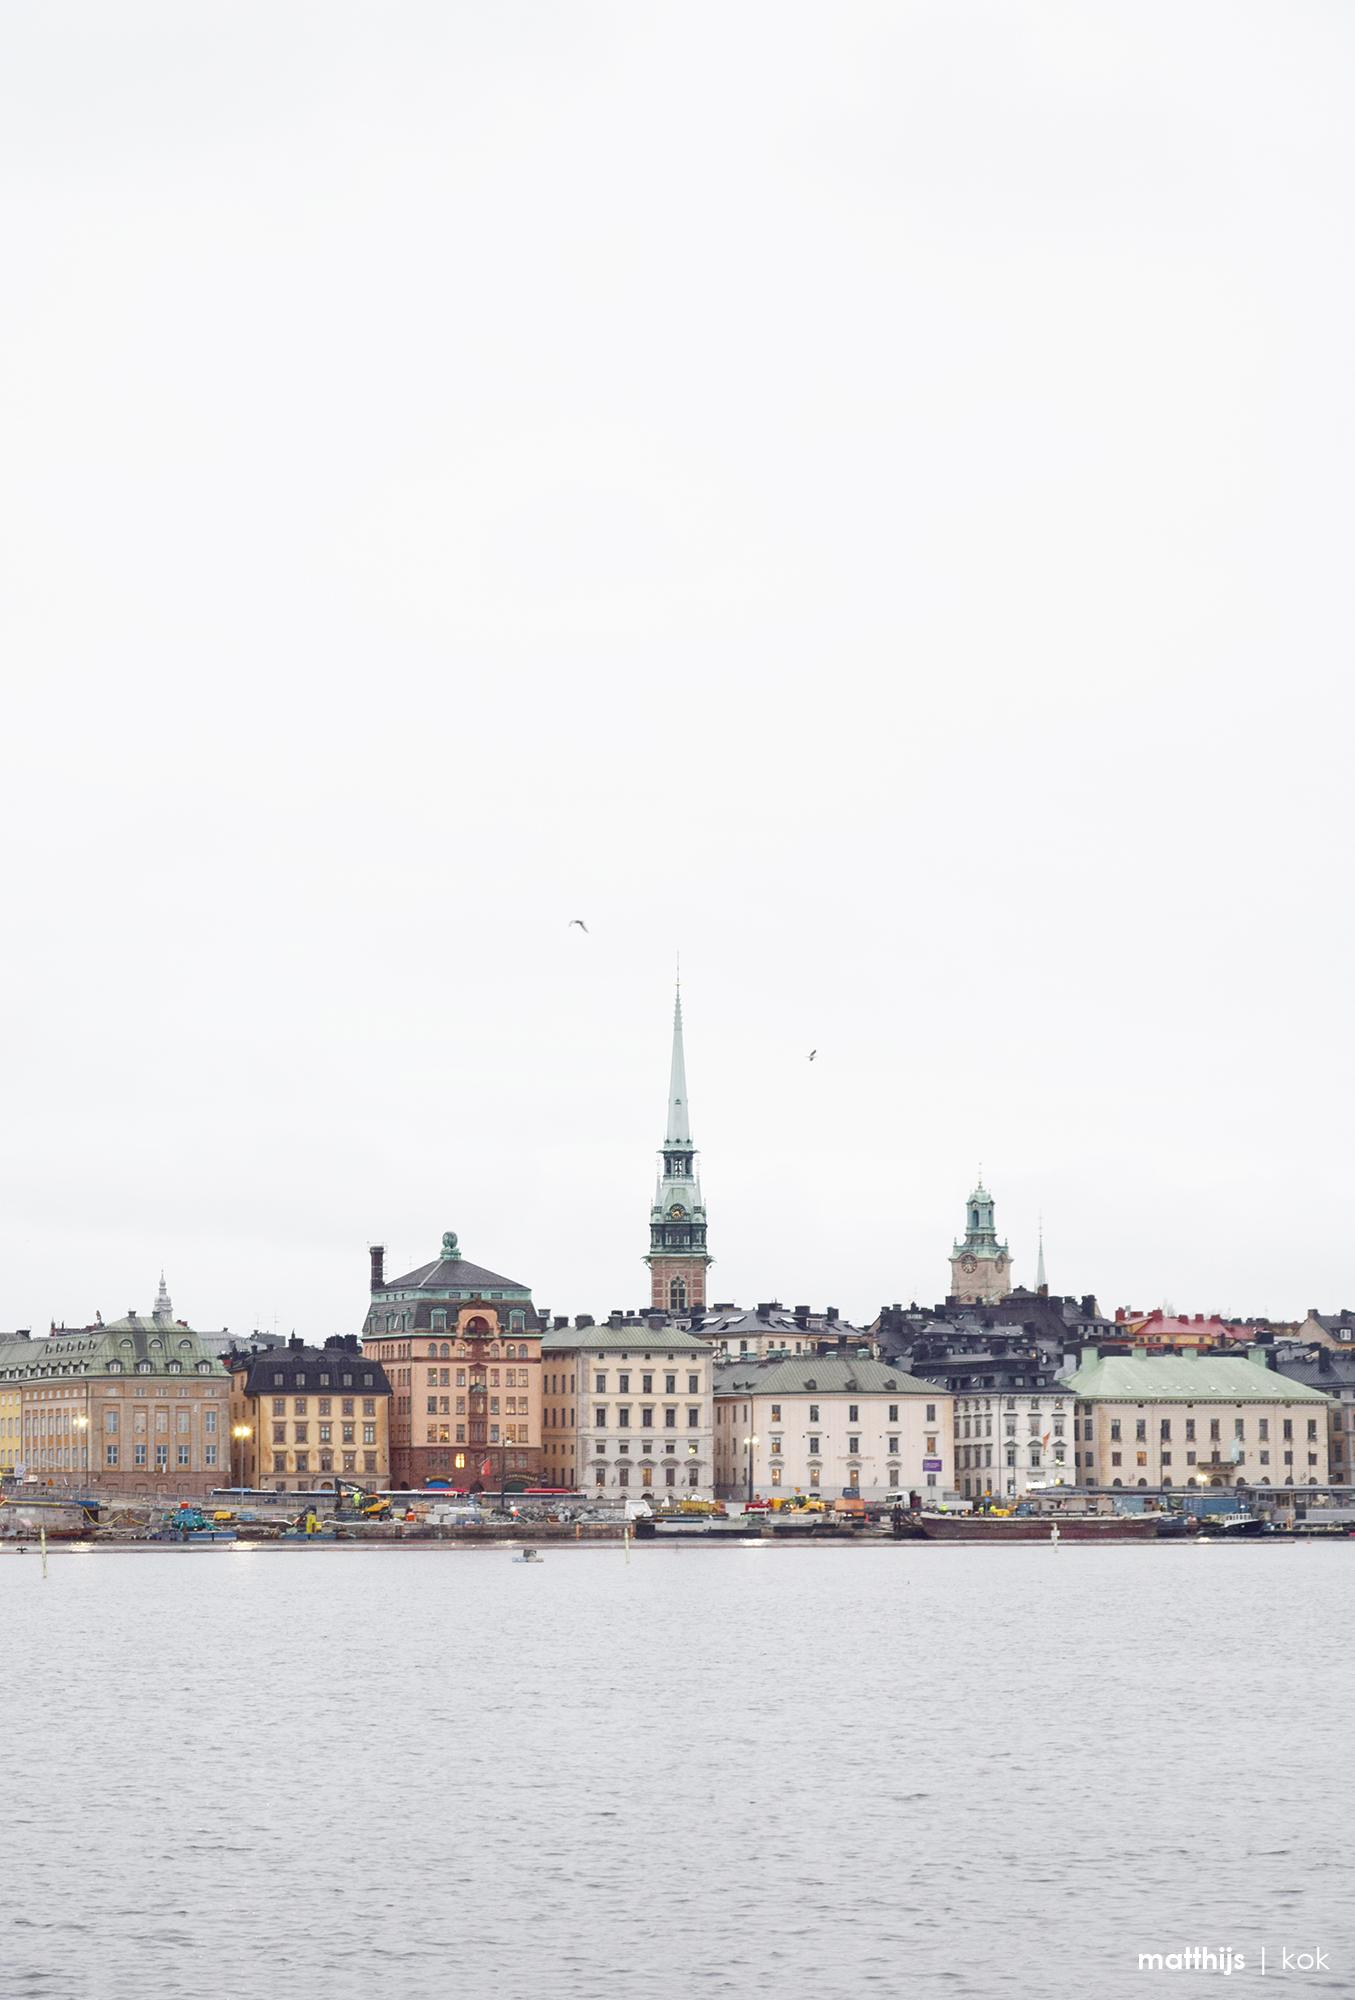 Gamla Stan, Stockholm, Sweden | Photo by Matthijs Kok